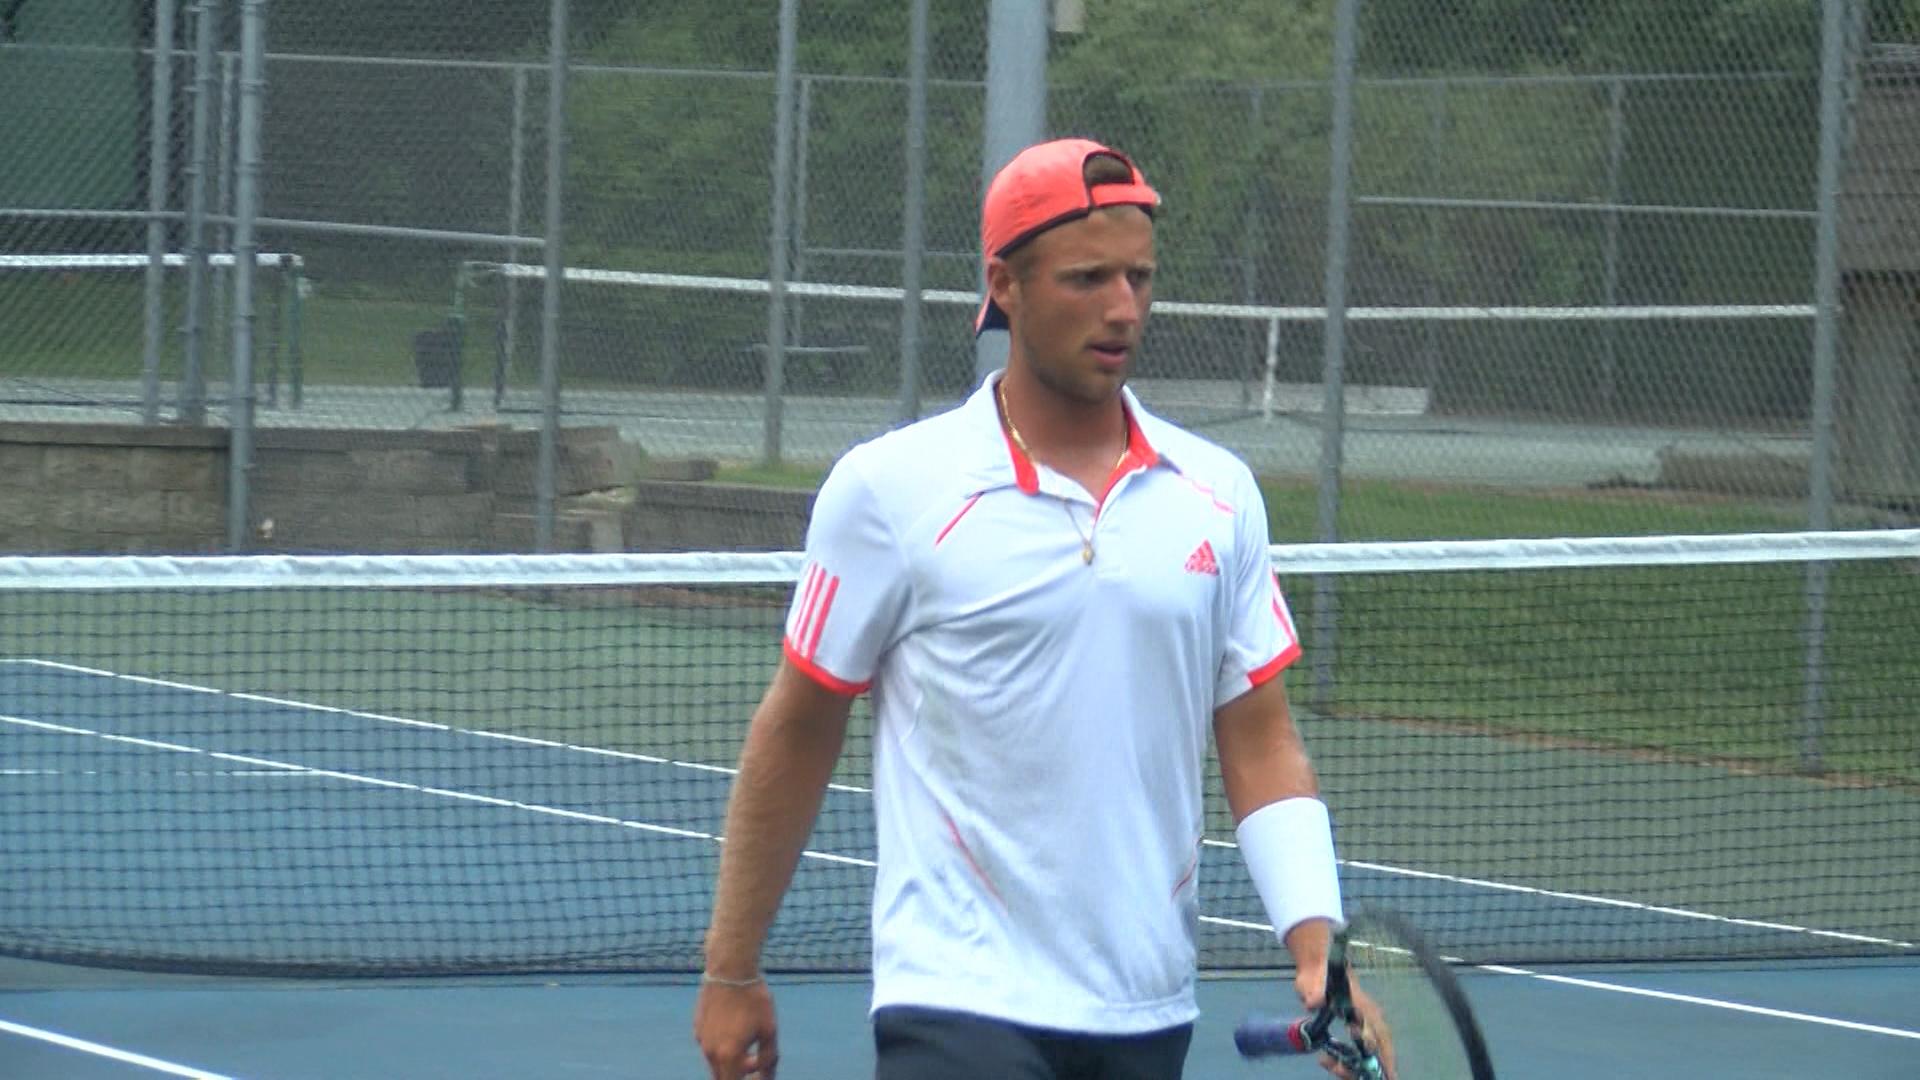 Victor Spolidorio (TC tennis)_1469753221269.jpg